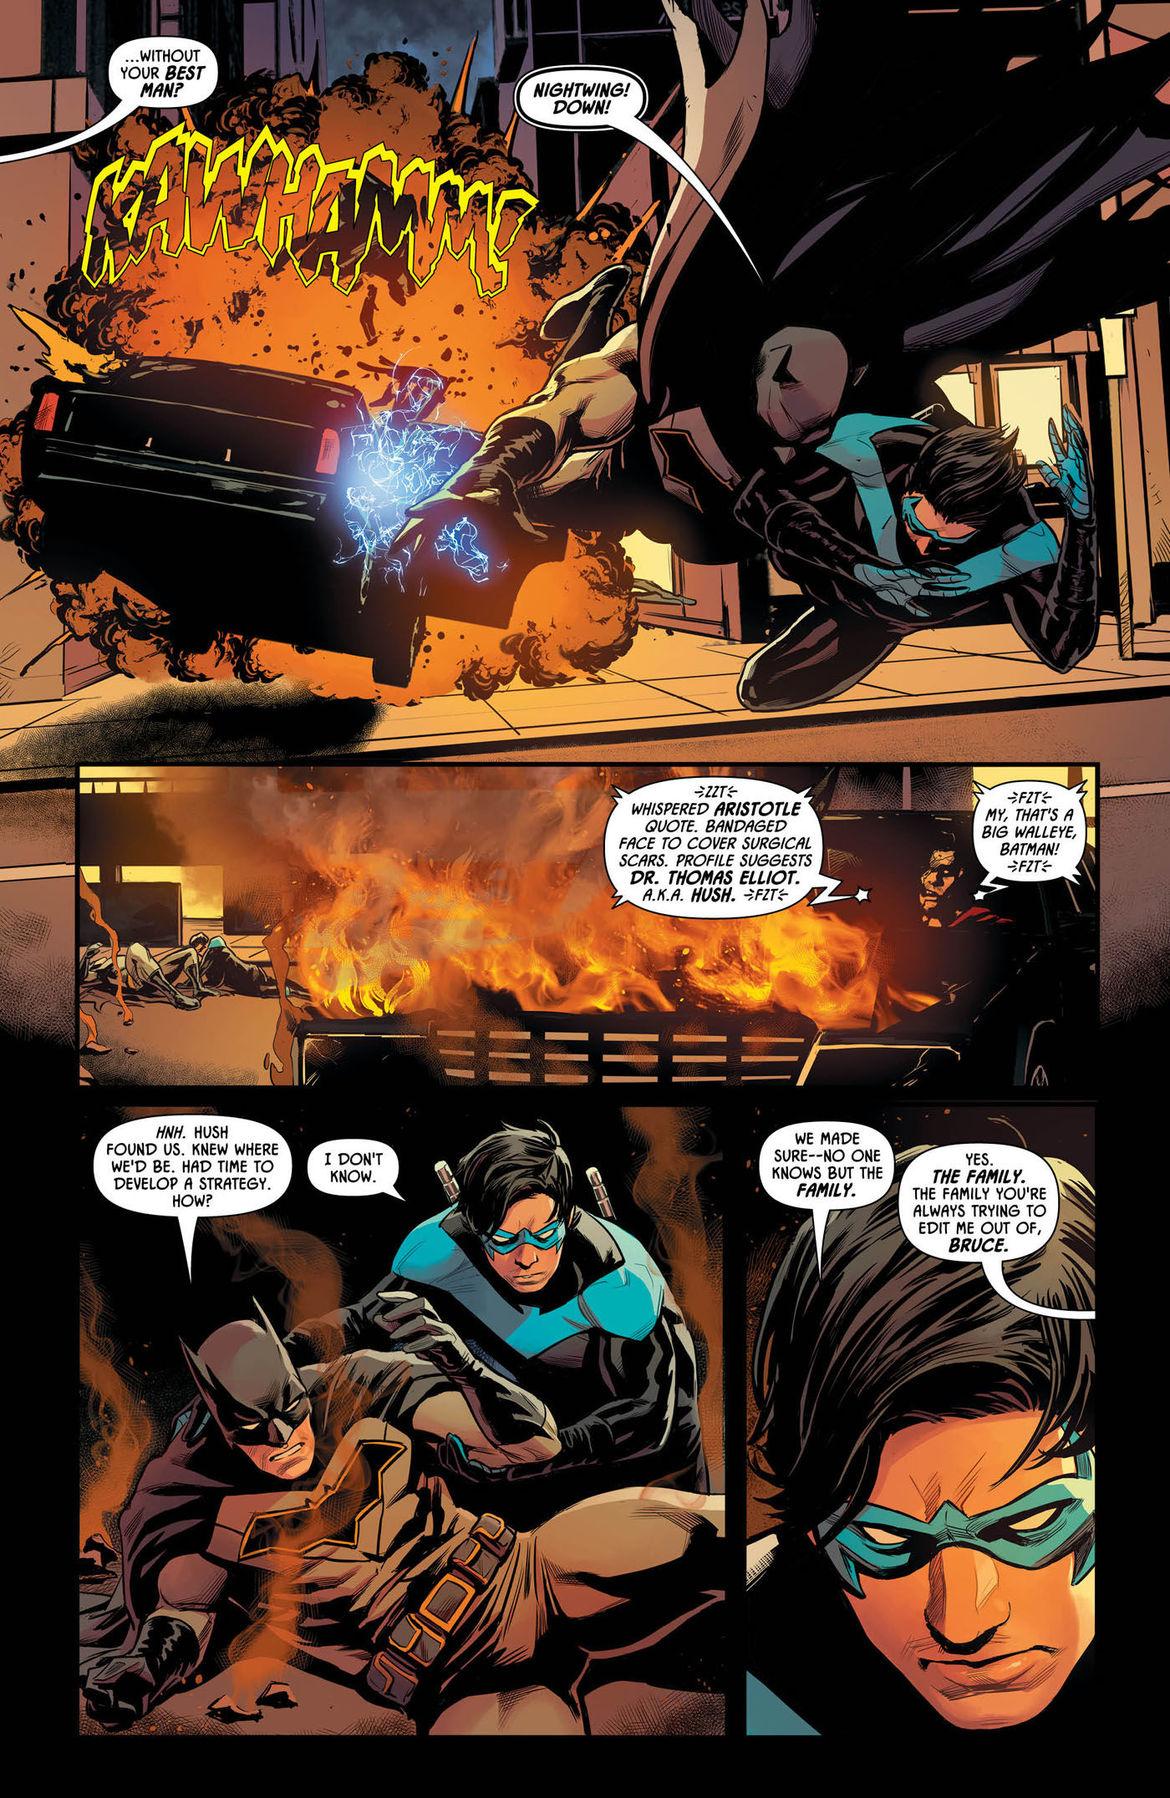 Batman Prelude to the Wedding Nightwing vs Hush 1 page 5